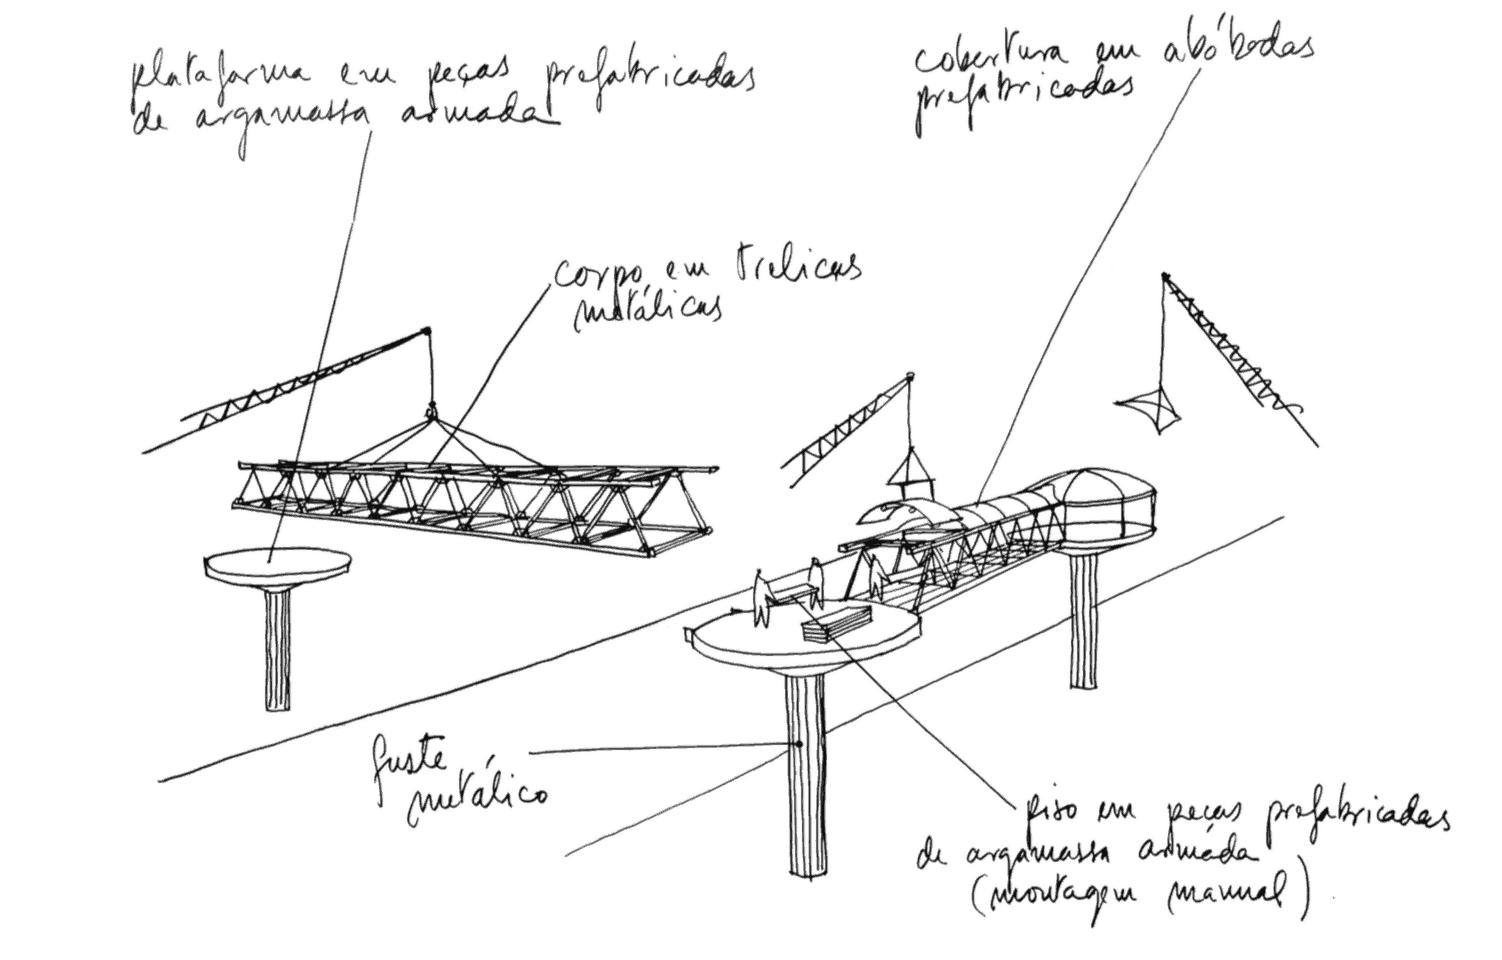 Assembly process. Industrialized footbridge, Brazil. Design and drawing by Lelé, 1987. JFL Archives